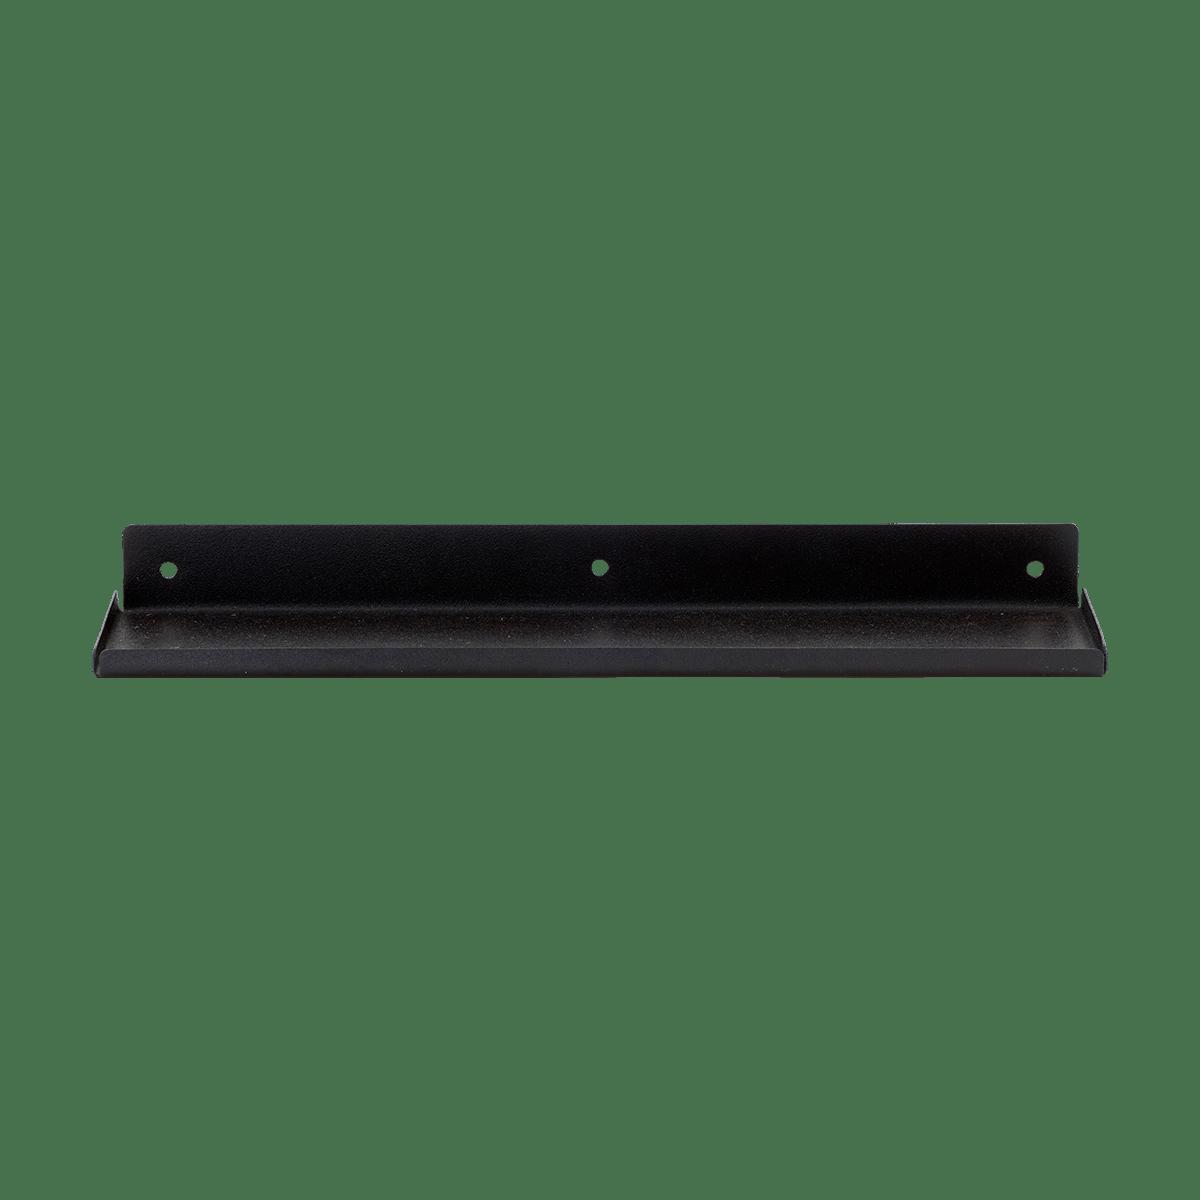 Sada 2 ks − Černá polička Ledge